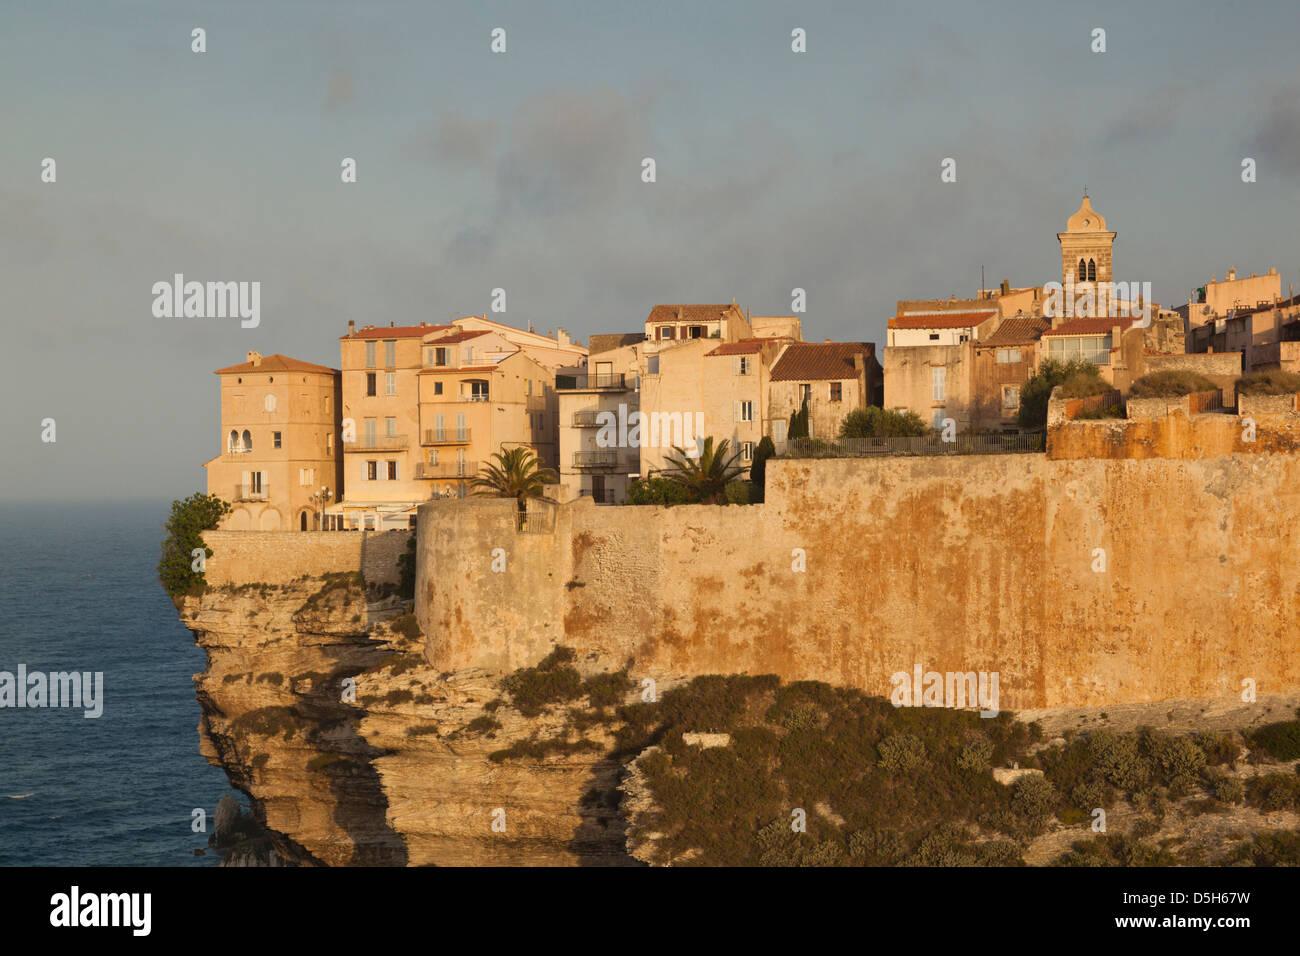 Frankreich, Korsika, Bonifacio, Cliffside Häuser, dawn Stockfoto